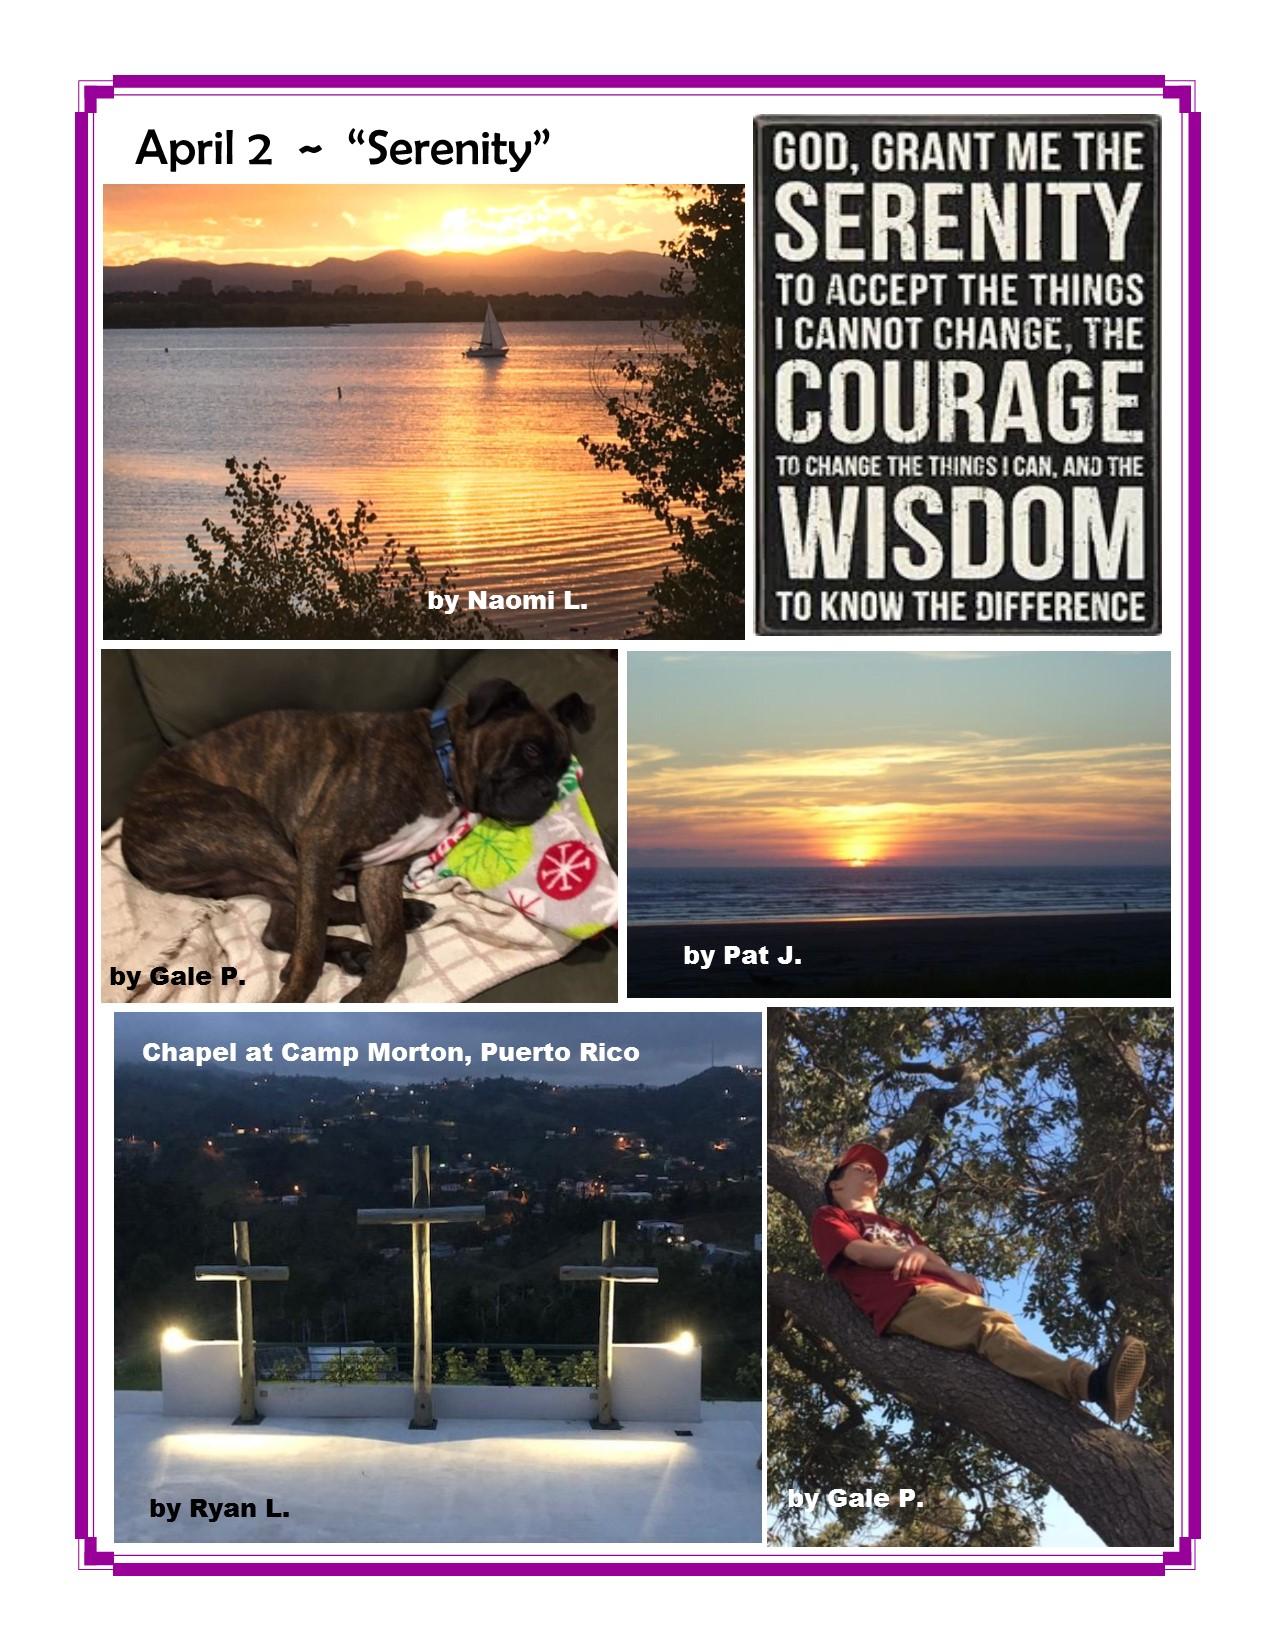 April 2, Serenity.jpg